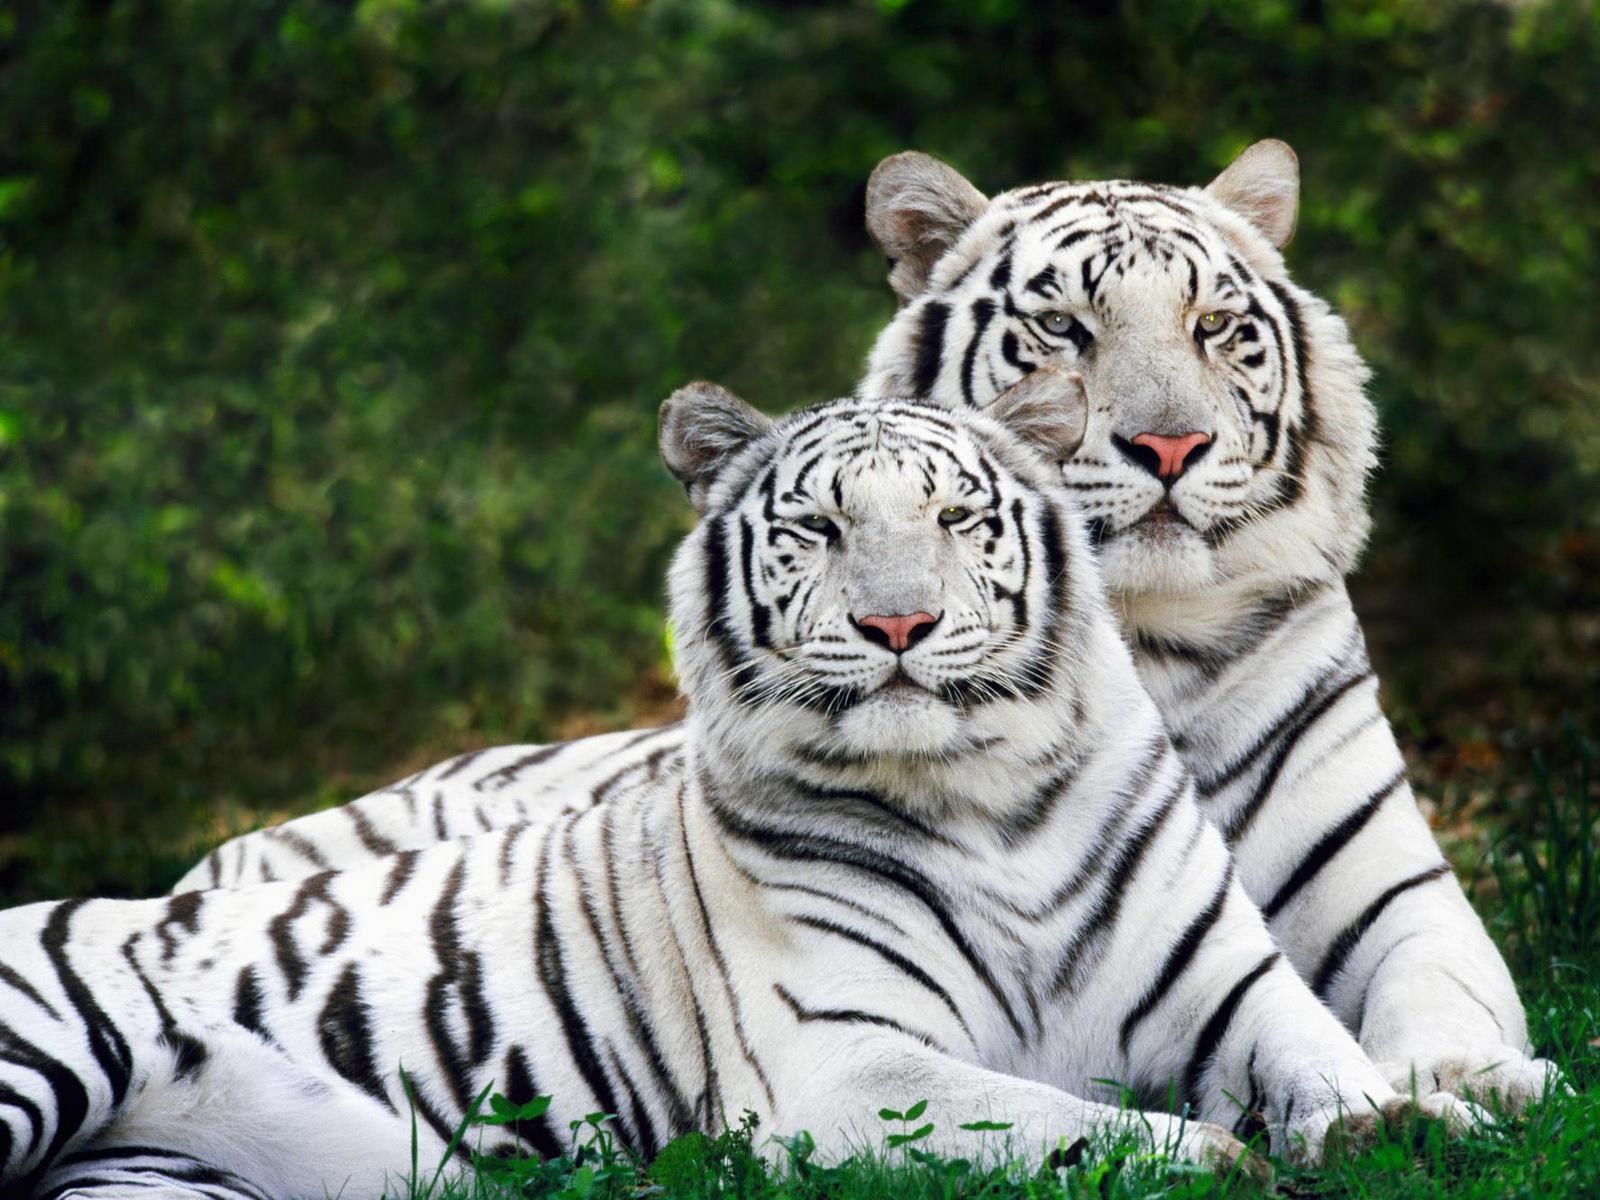 Desktop Wallpapers Backgrounds Tiger Wallpapers Lion 1600x1200